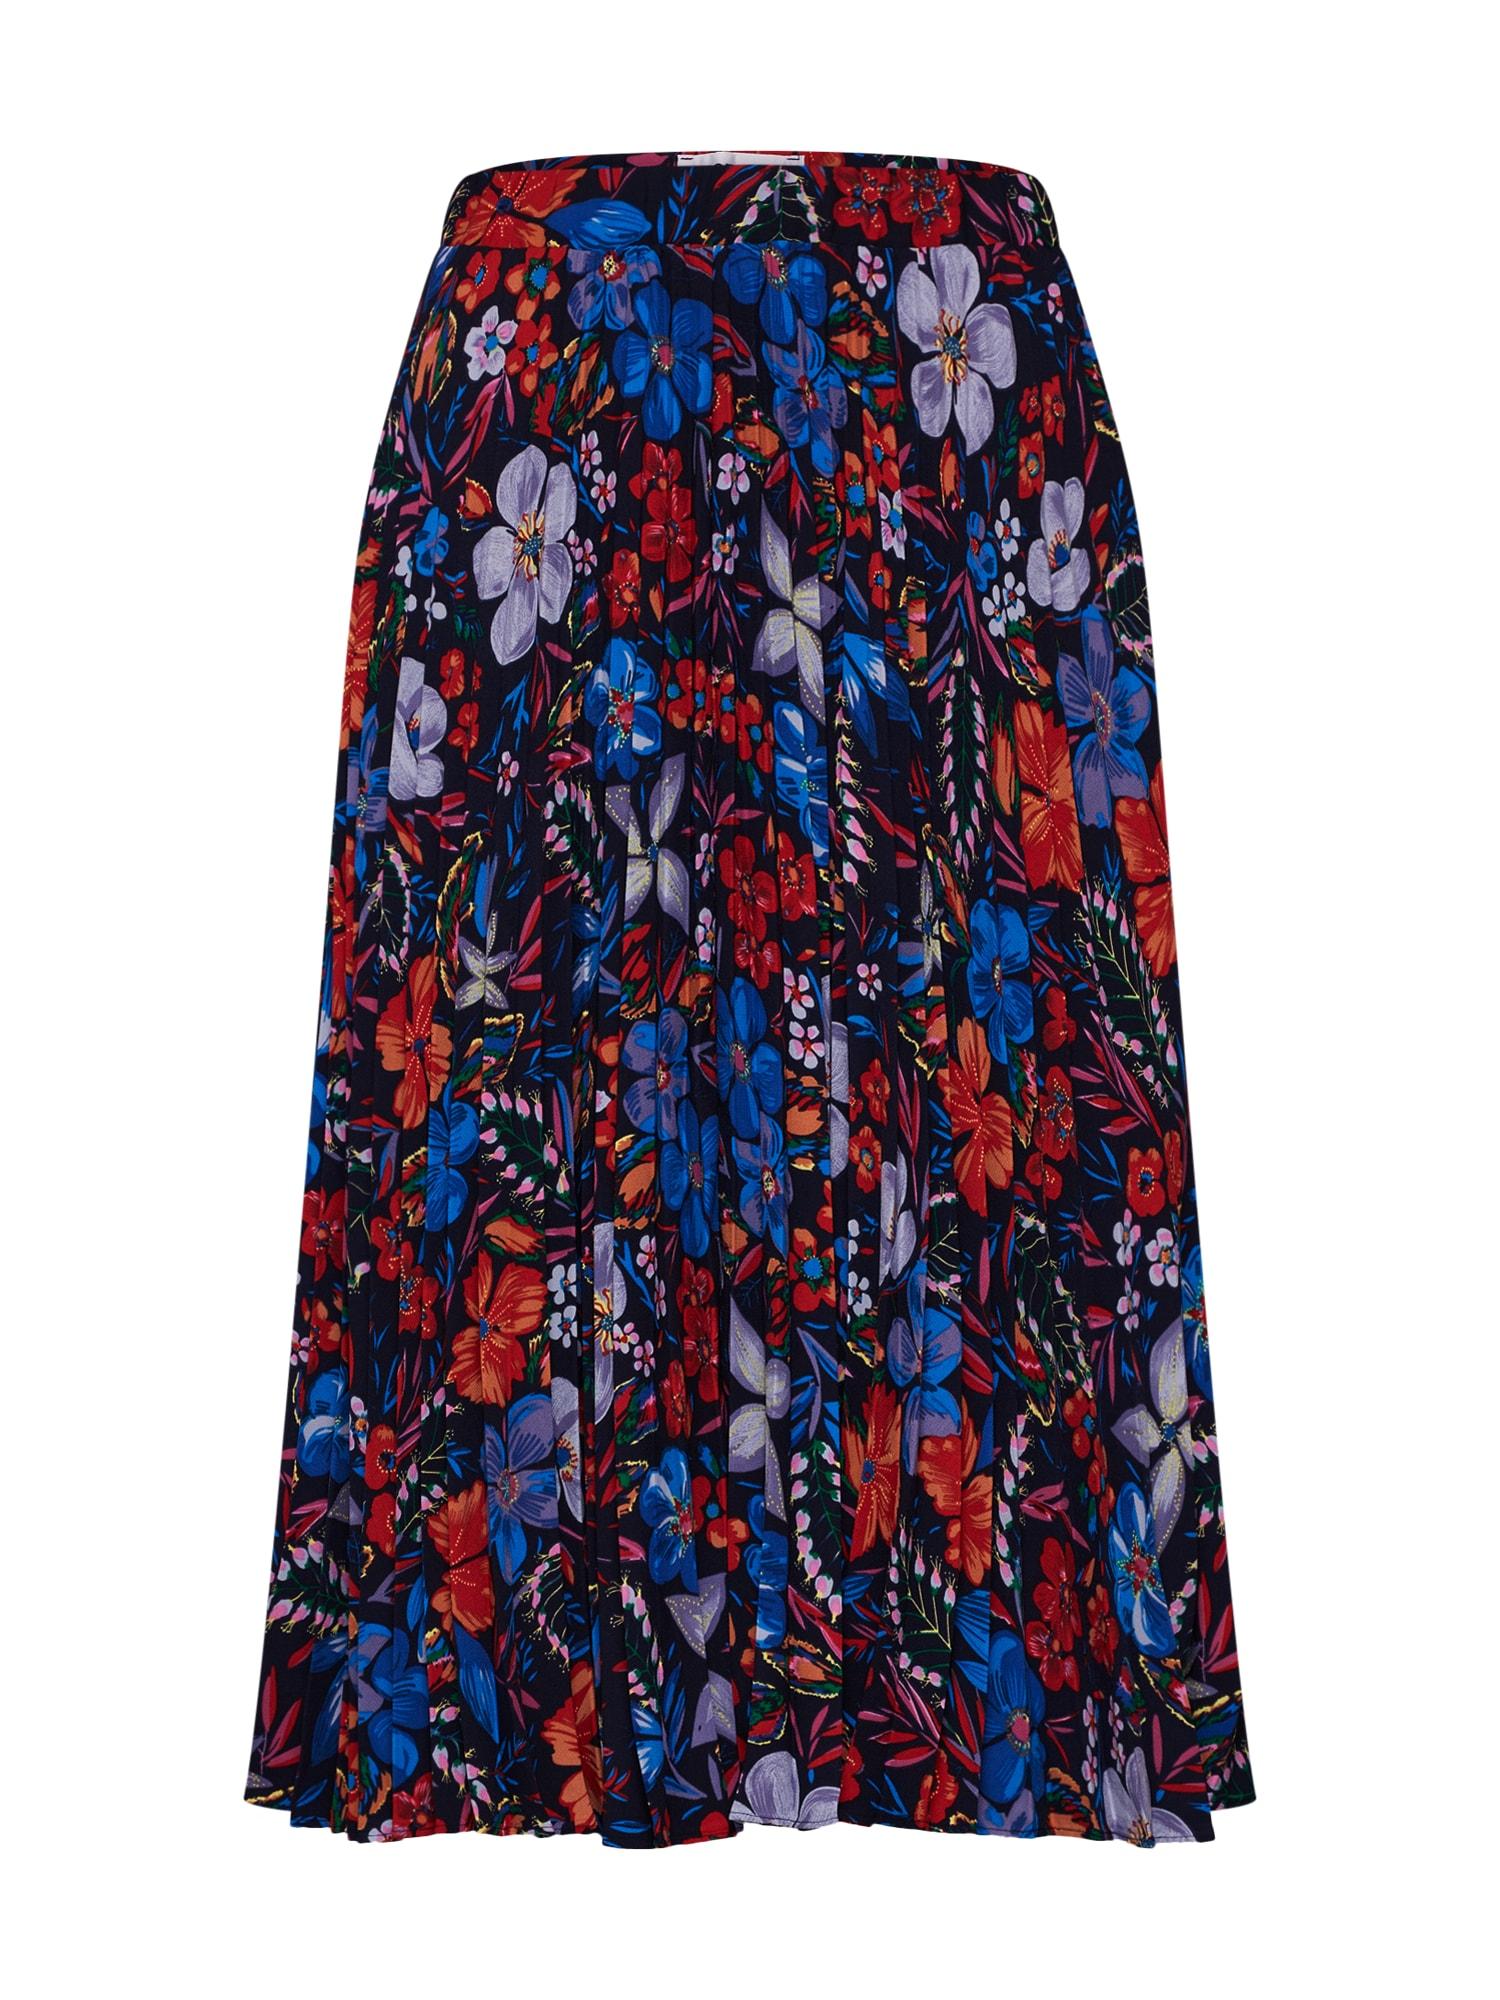 Sukně Saymond pleated skirt mix barev černá Essentiel Antwerp